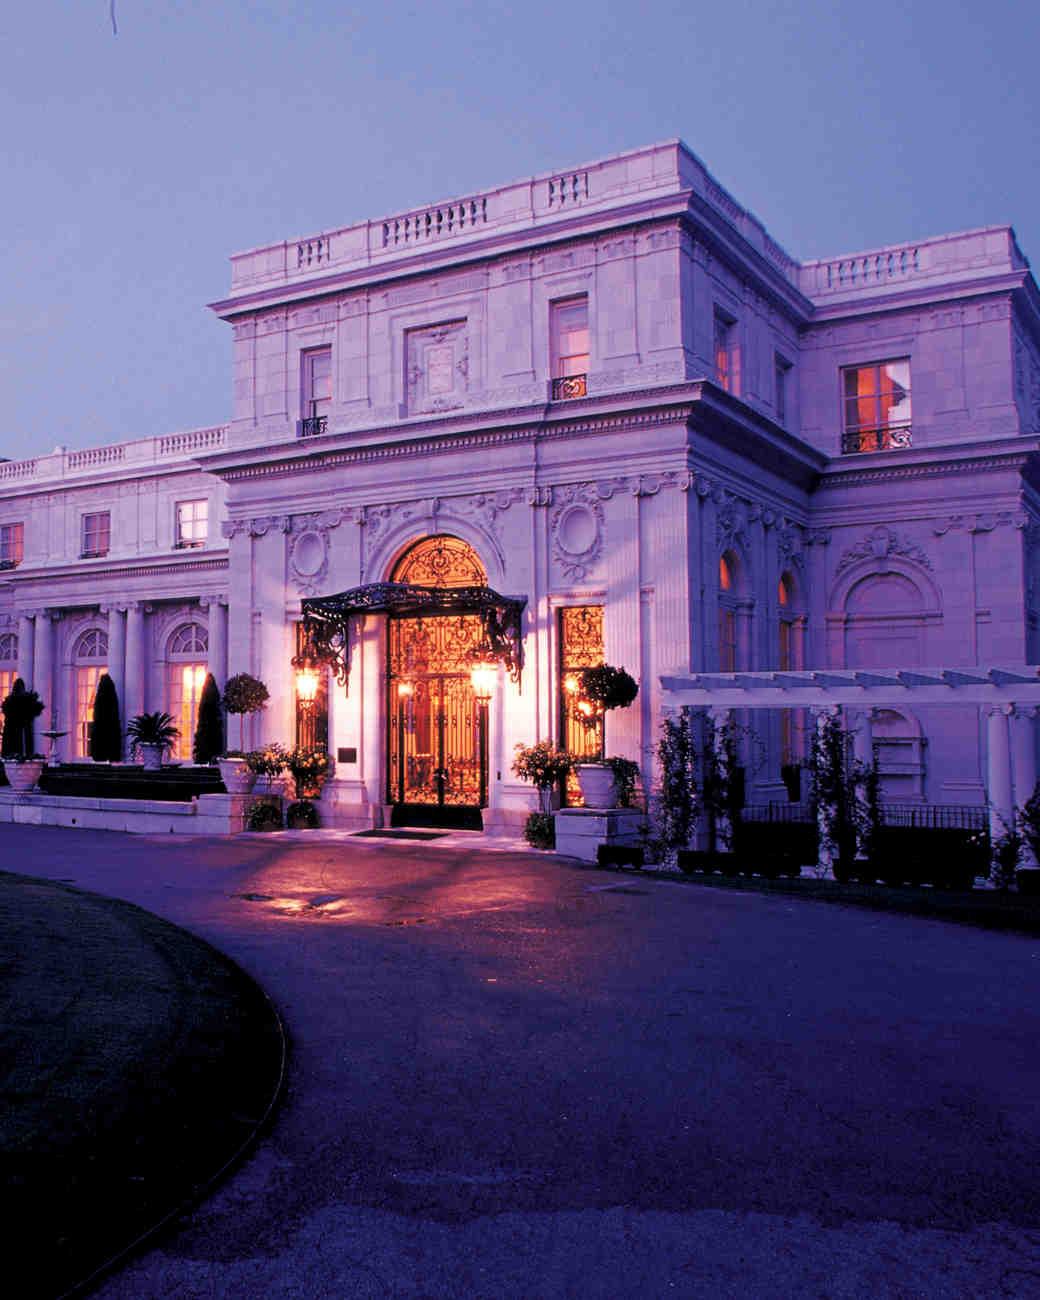 filming-locations-wedding-venues-rosecliff-great-gatsby-0215.jpg